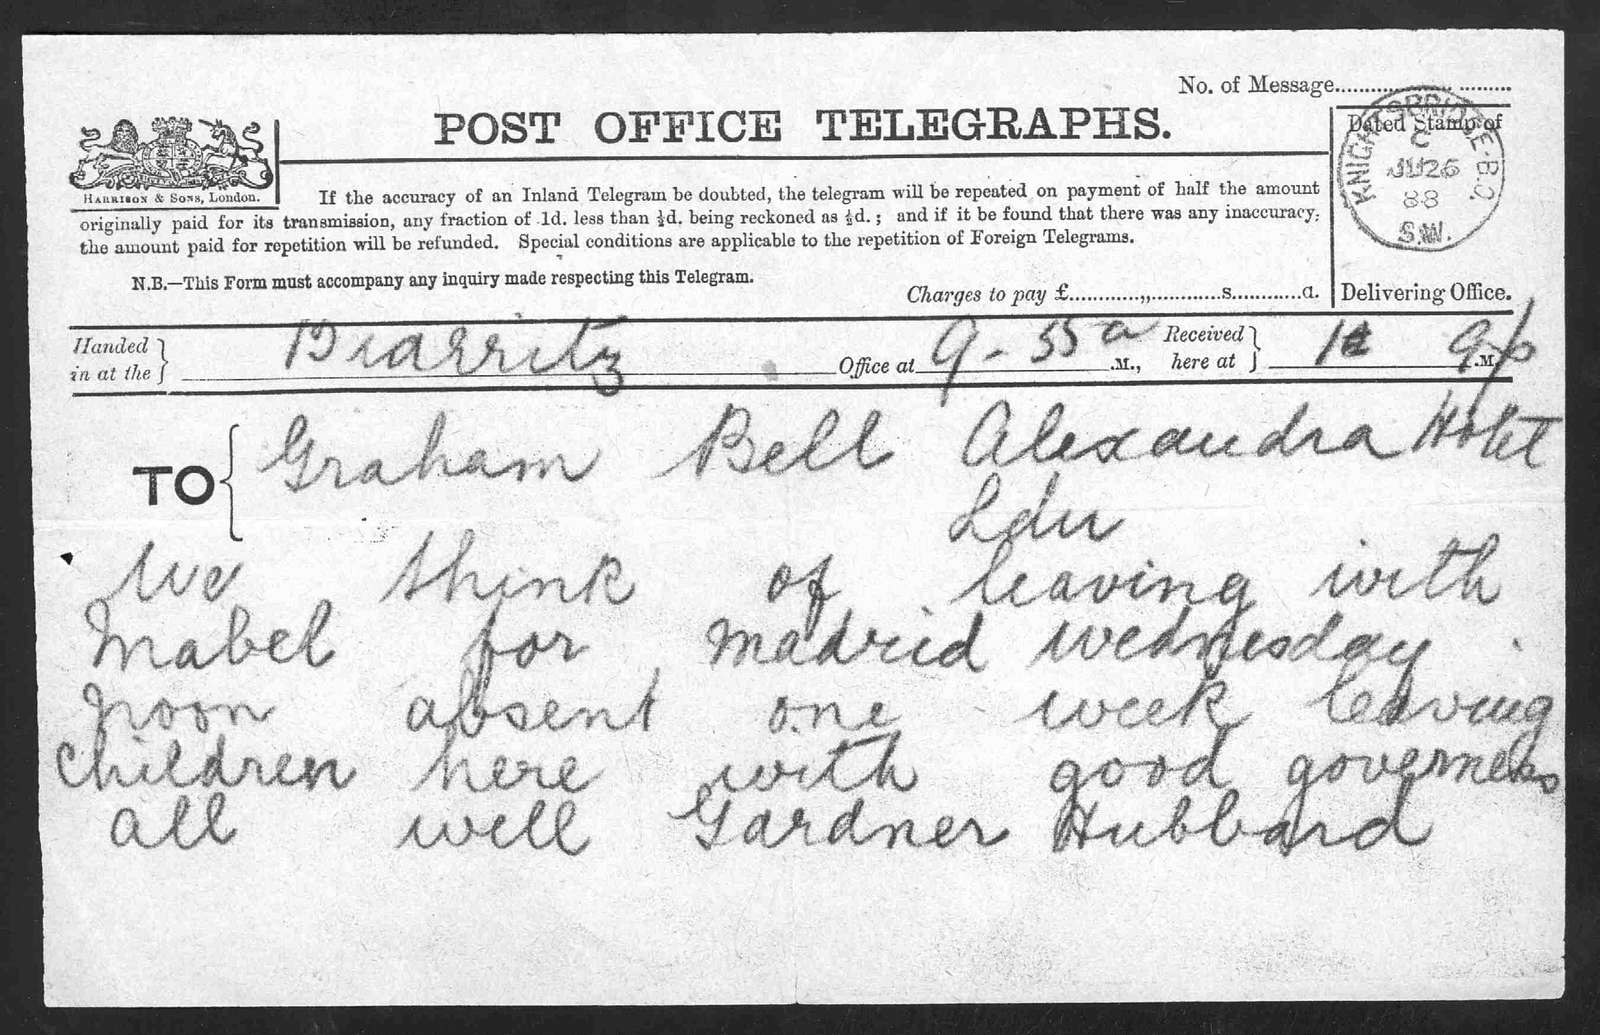 Telegram from Gardiner Greene Hubbard to Alexander Graham Bell, June 26, 1888